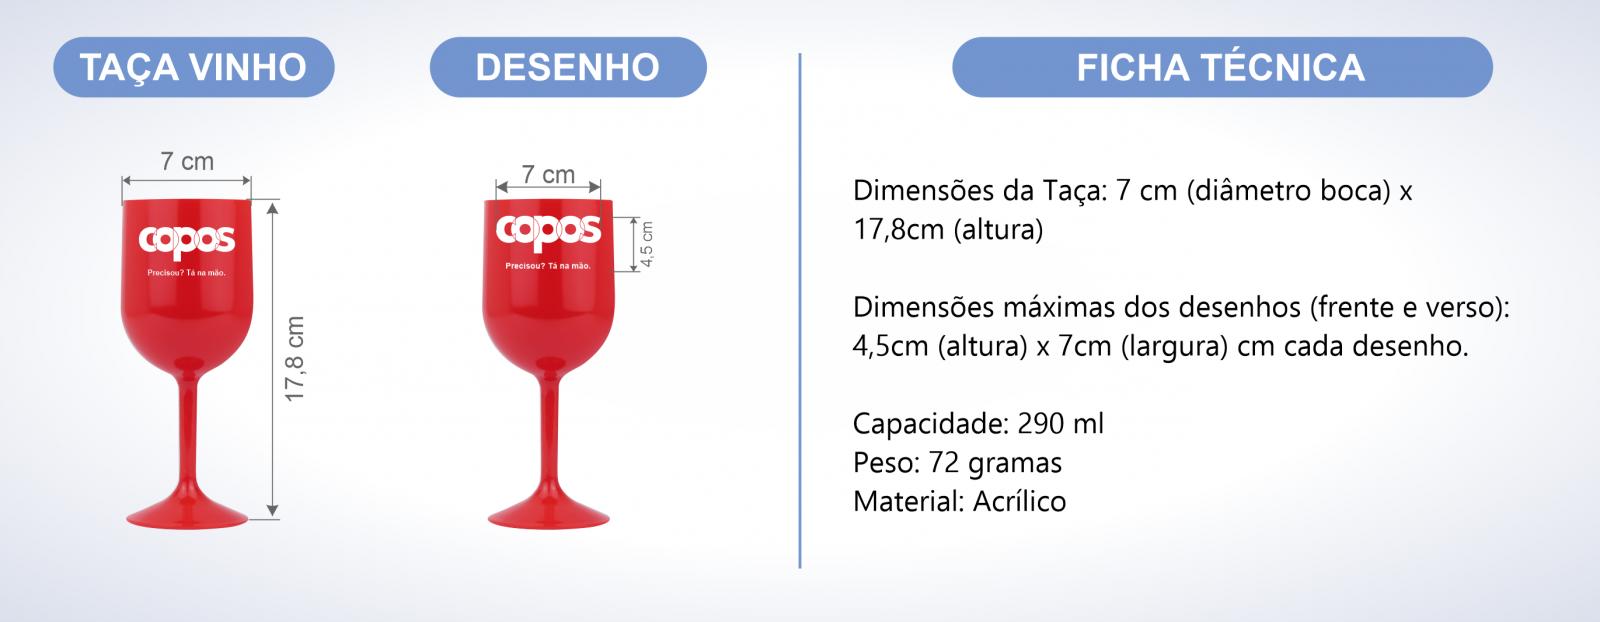 Especificaes Taa Vinho PLATAFORMA